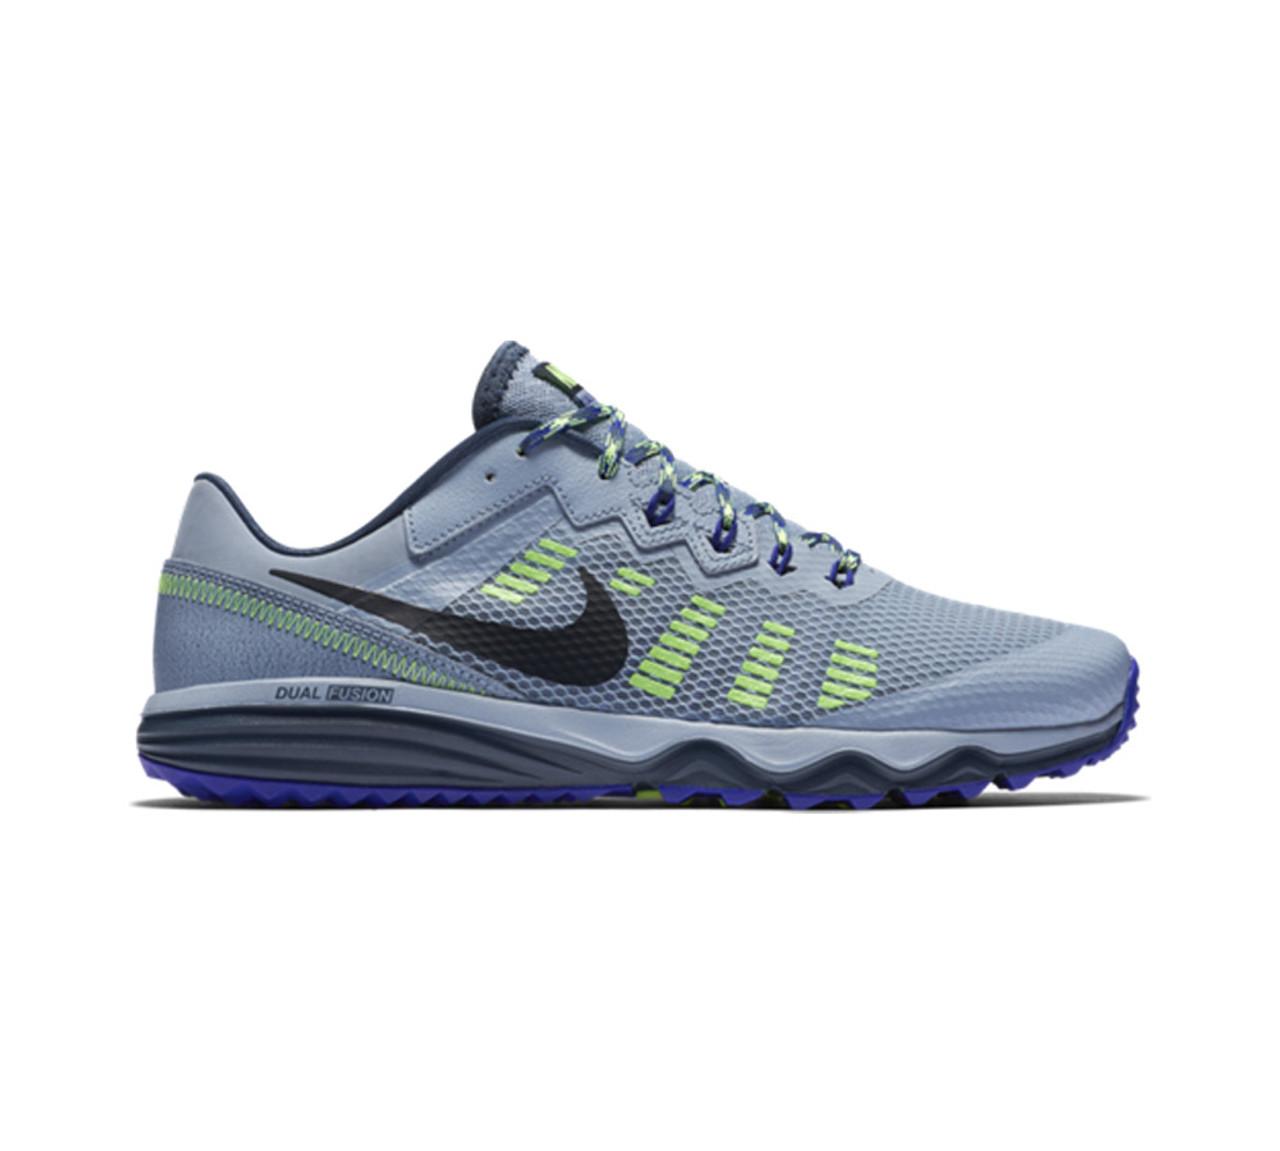 Dzungla Zadaca Kljuc Nike Dual Fusion Trail 2 Mens Telfor Org